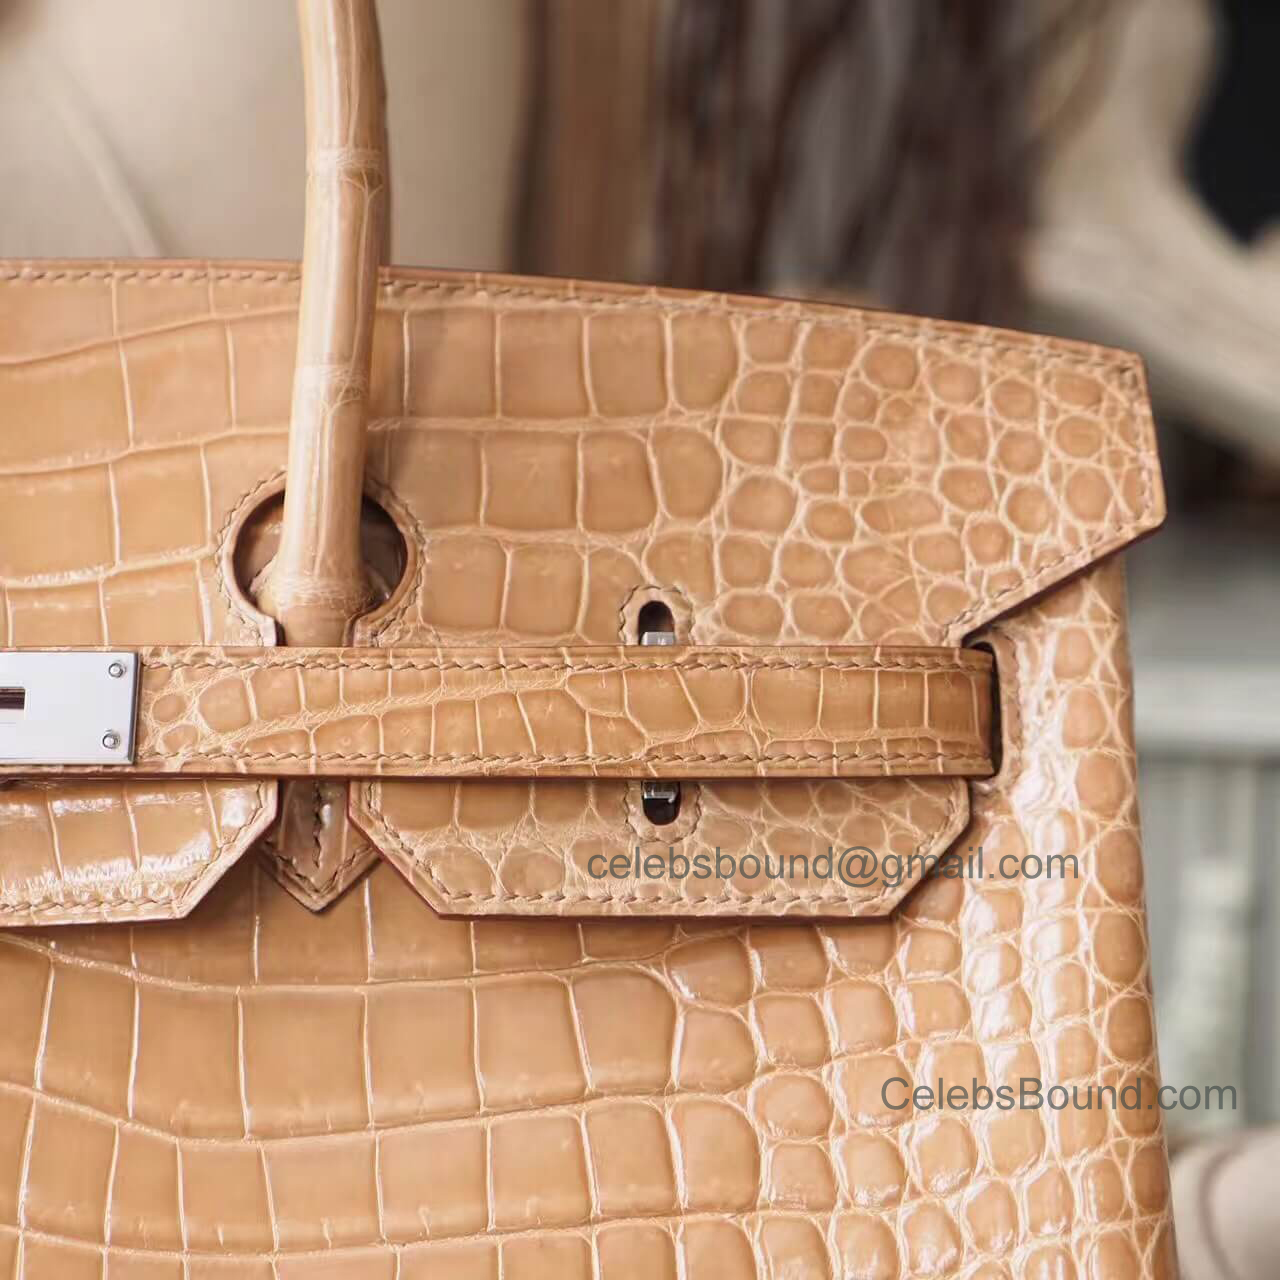 eda979c18c7b Copy Hermes Birkin 35 Bag in ck14 Beige Shiny Porosus Croc PHW -